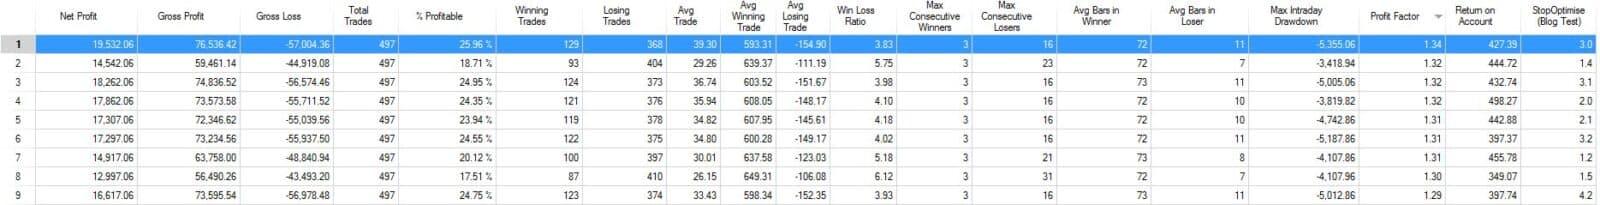 Volatility Stop using Average True Range optimisation results